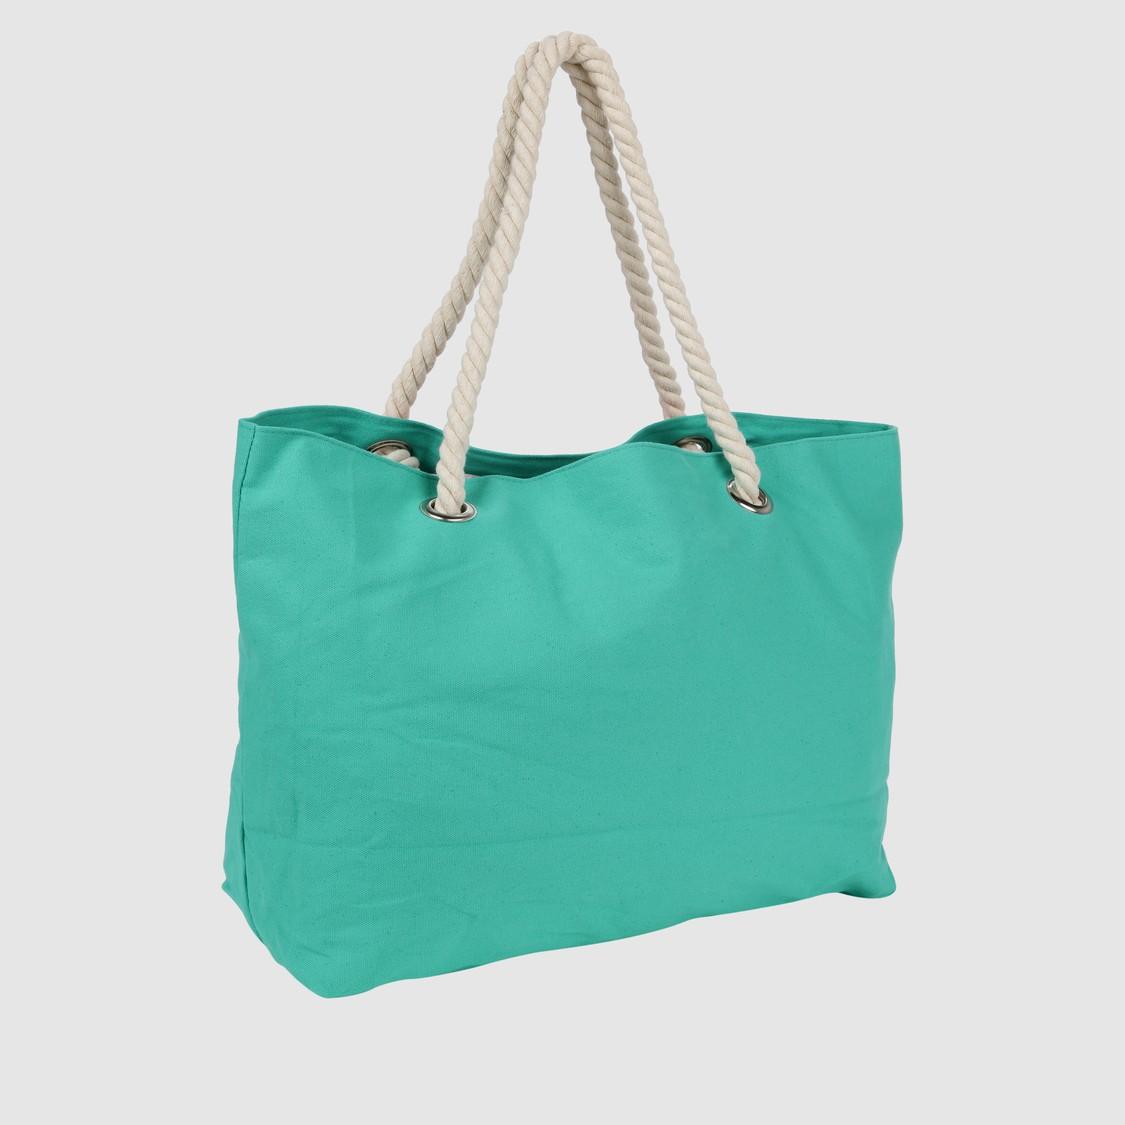 Printed Handbag with Dual Straps